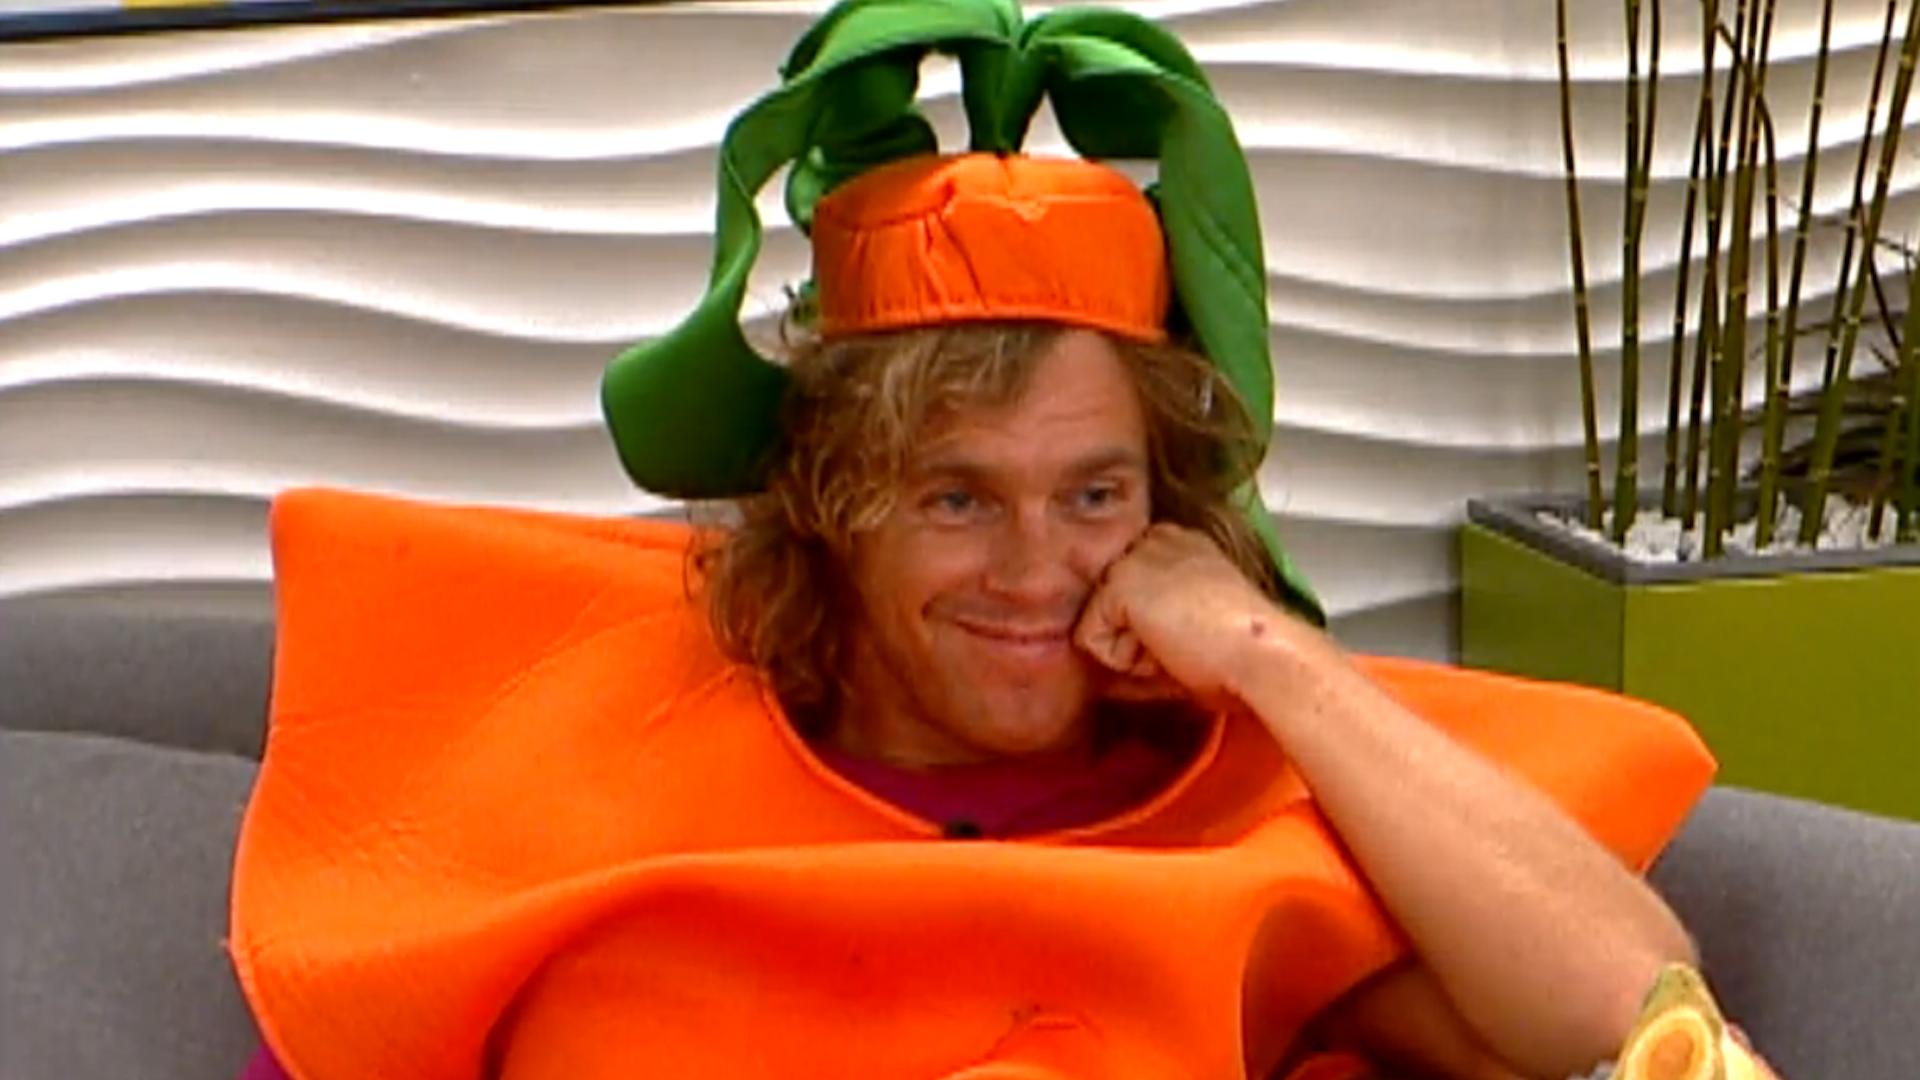 Frank Eudy's carrot costume